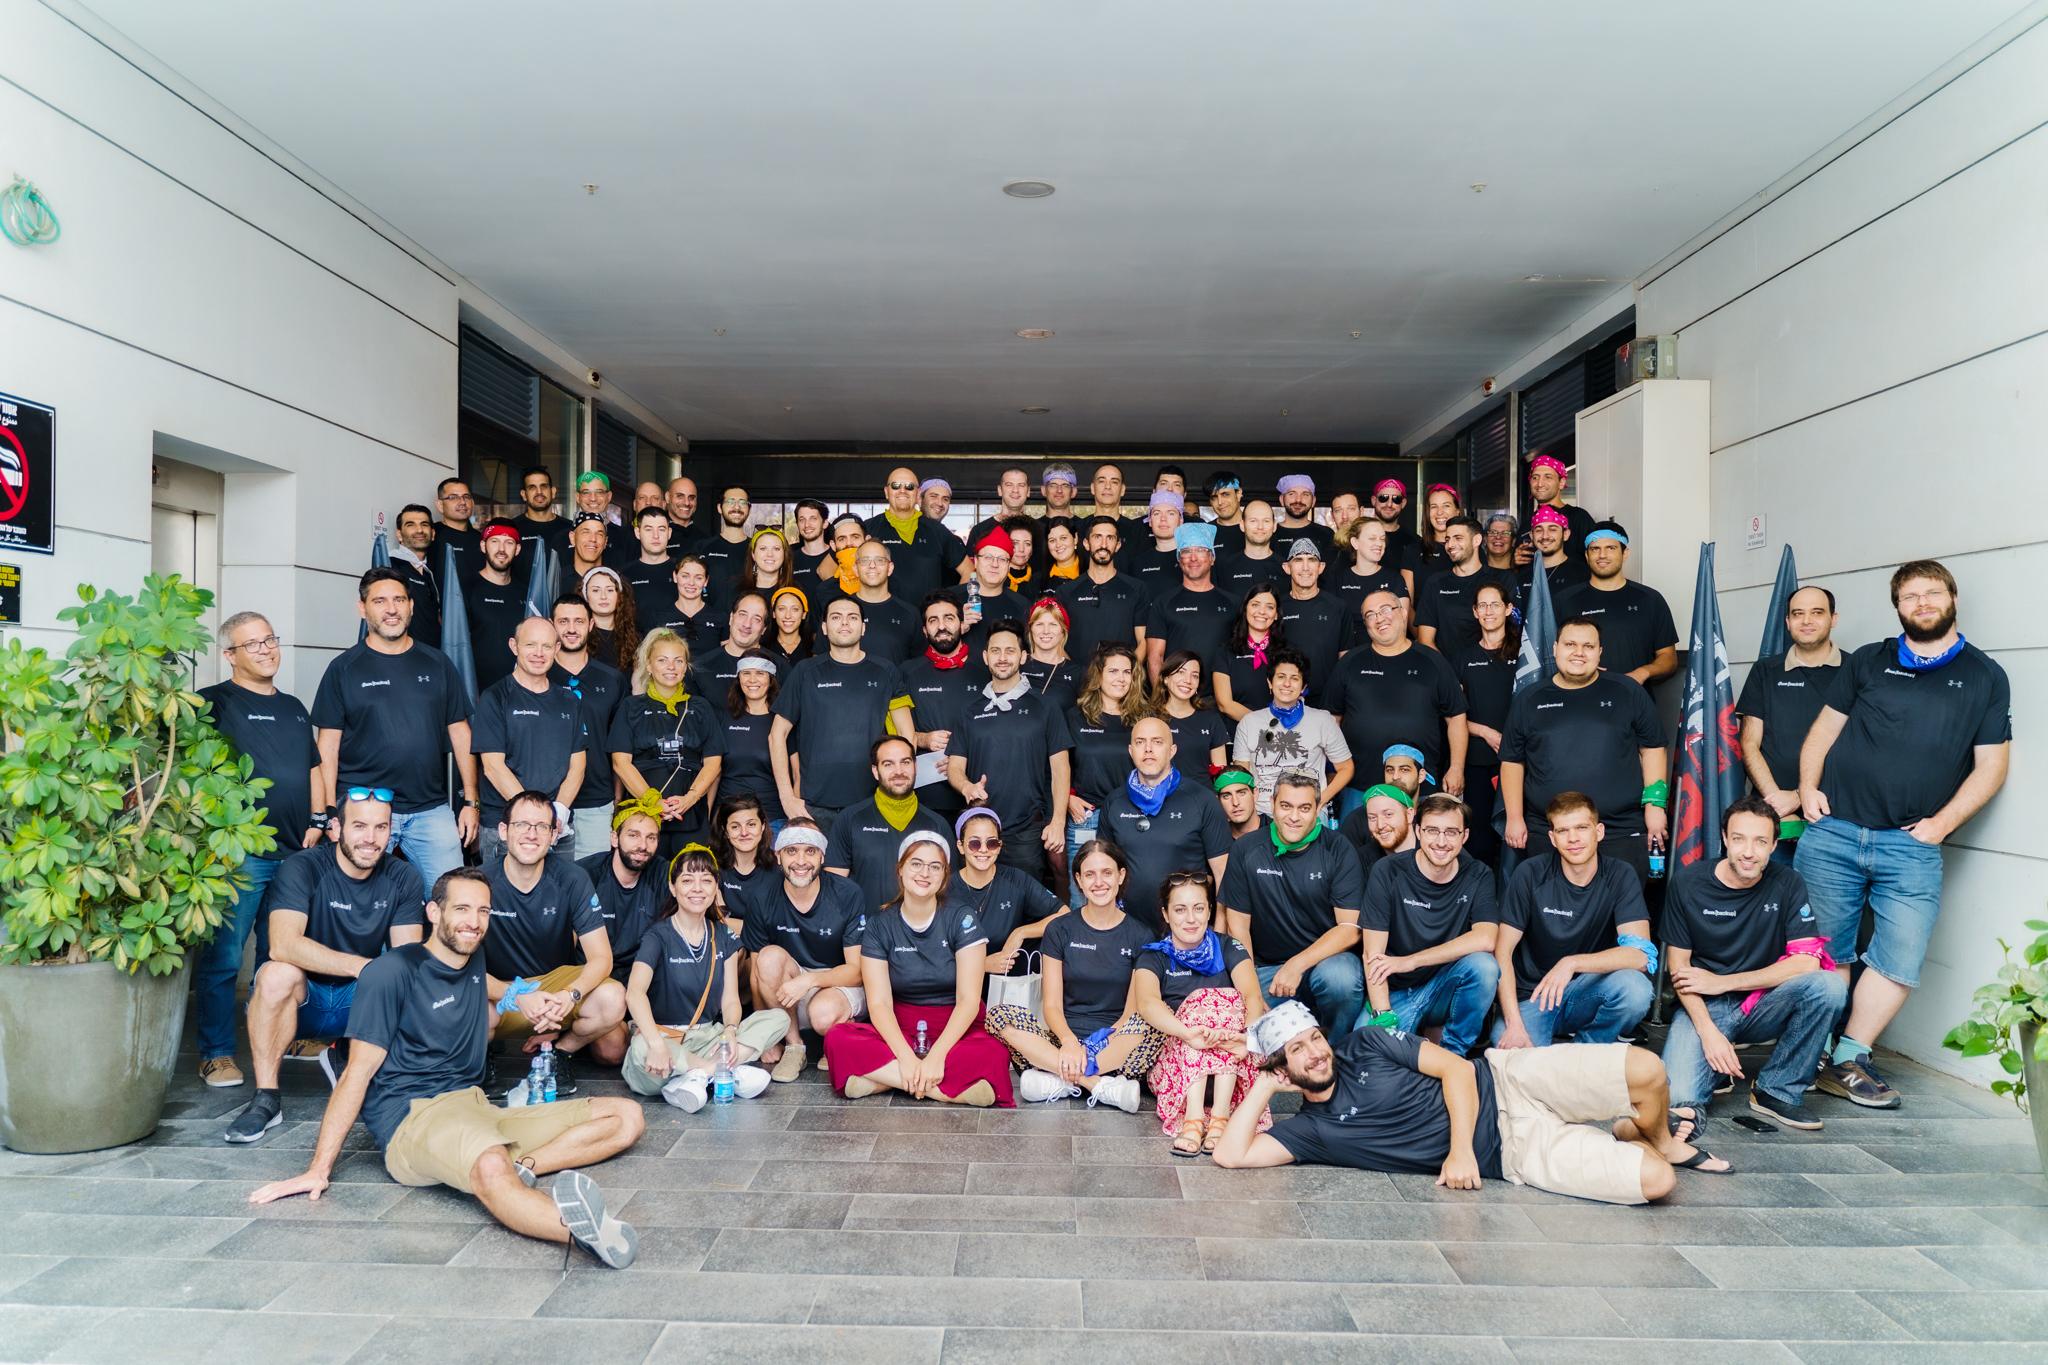 OwnBackup employees. Photo: Buxa